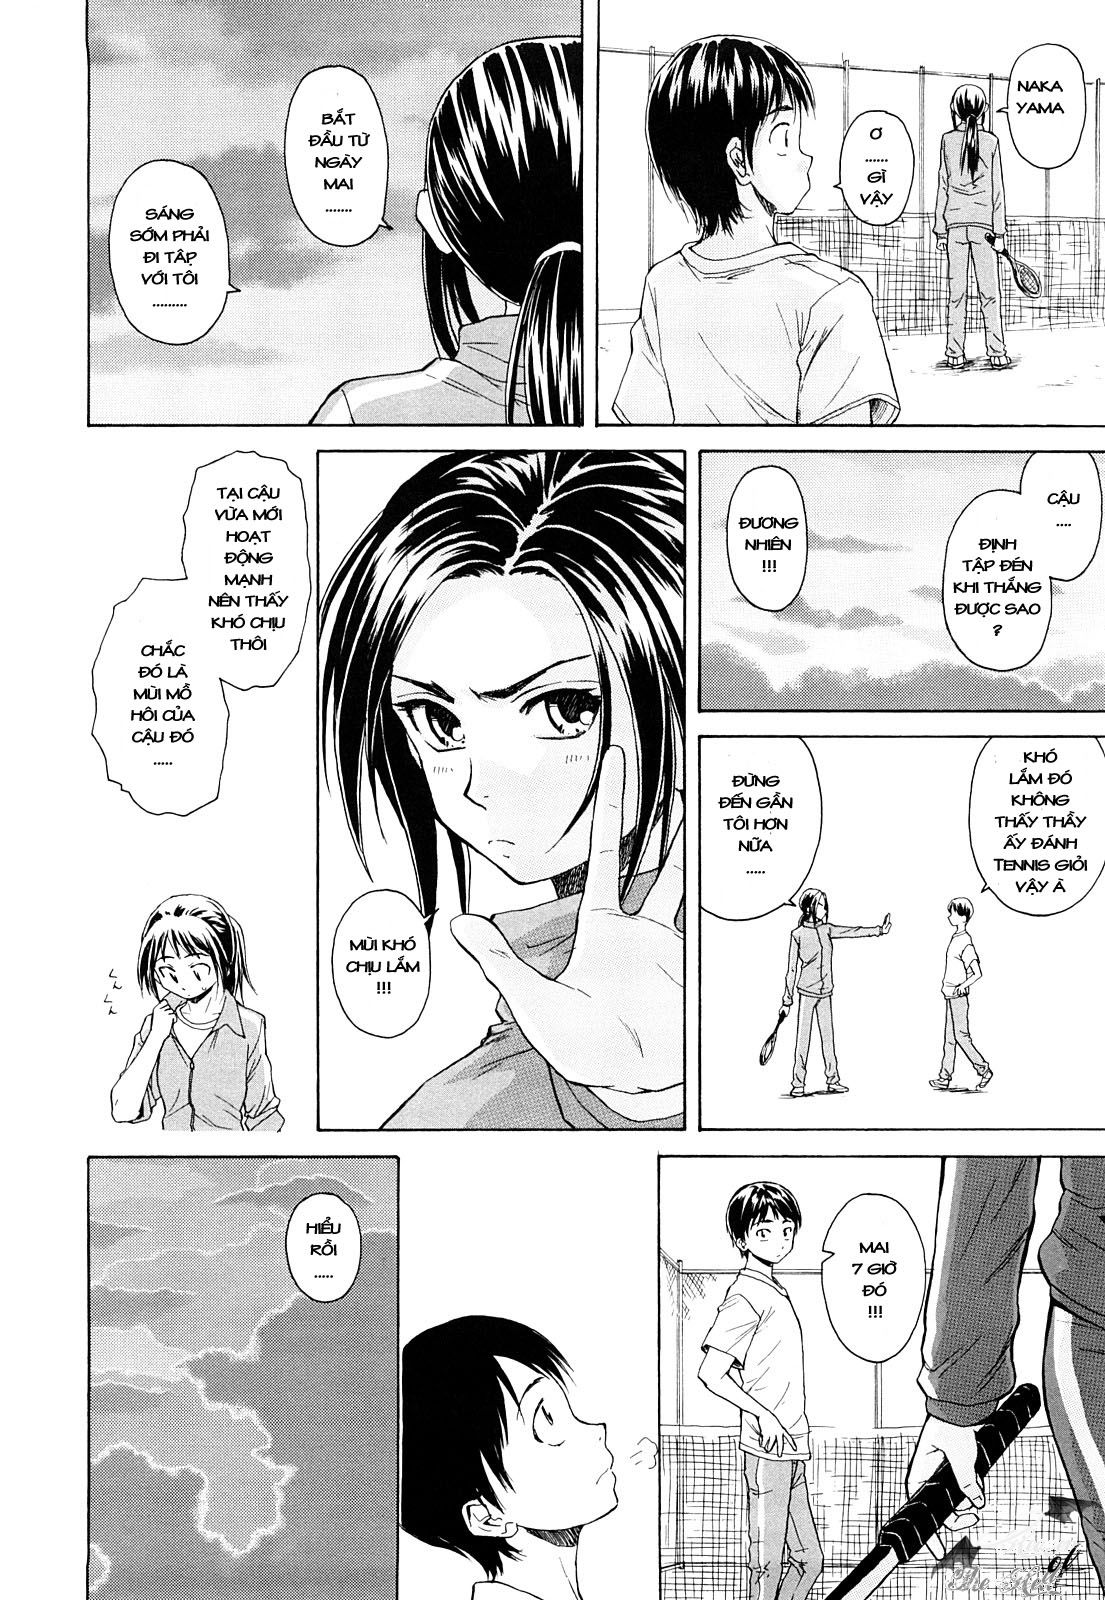 TruyenHay.Com - Ảnh 13 - Setsunai Omoi Chapter 1